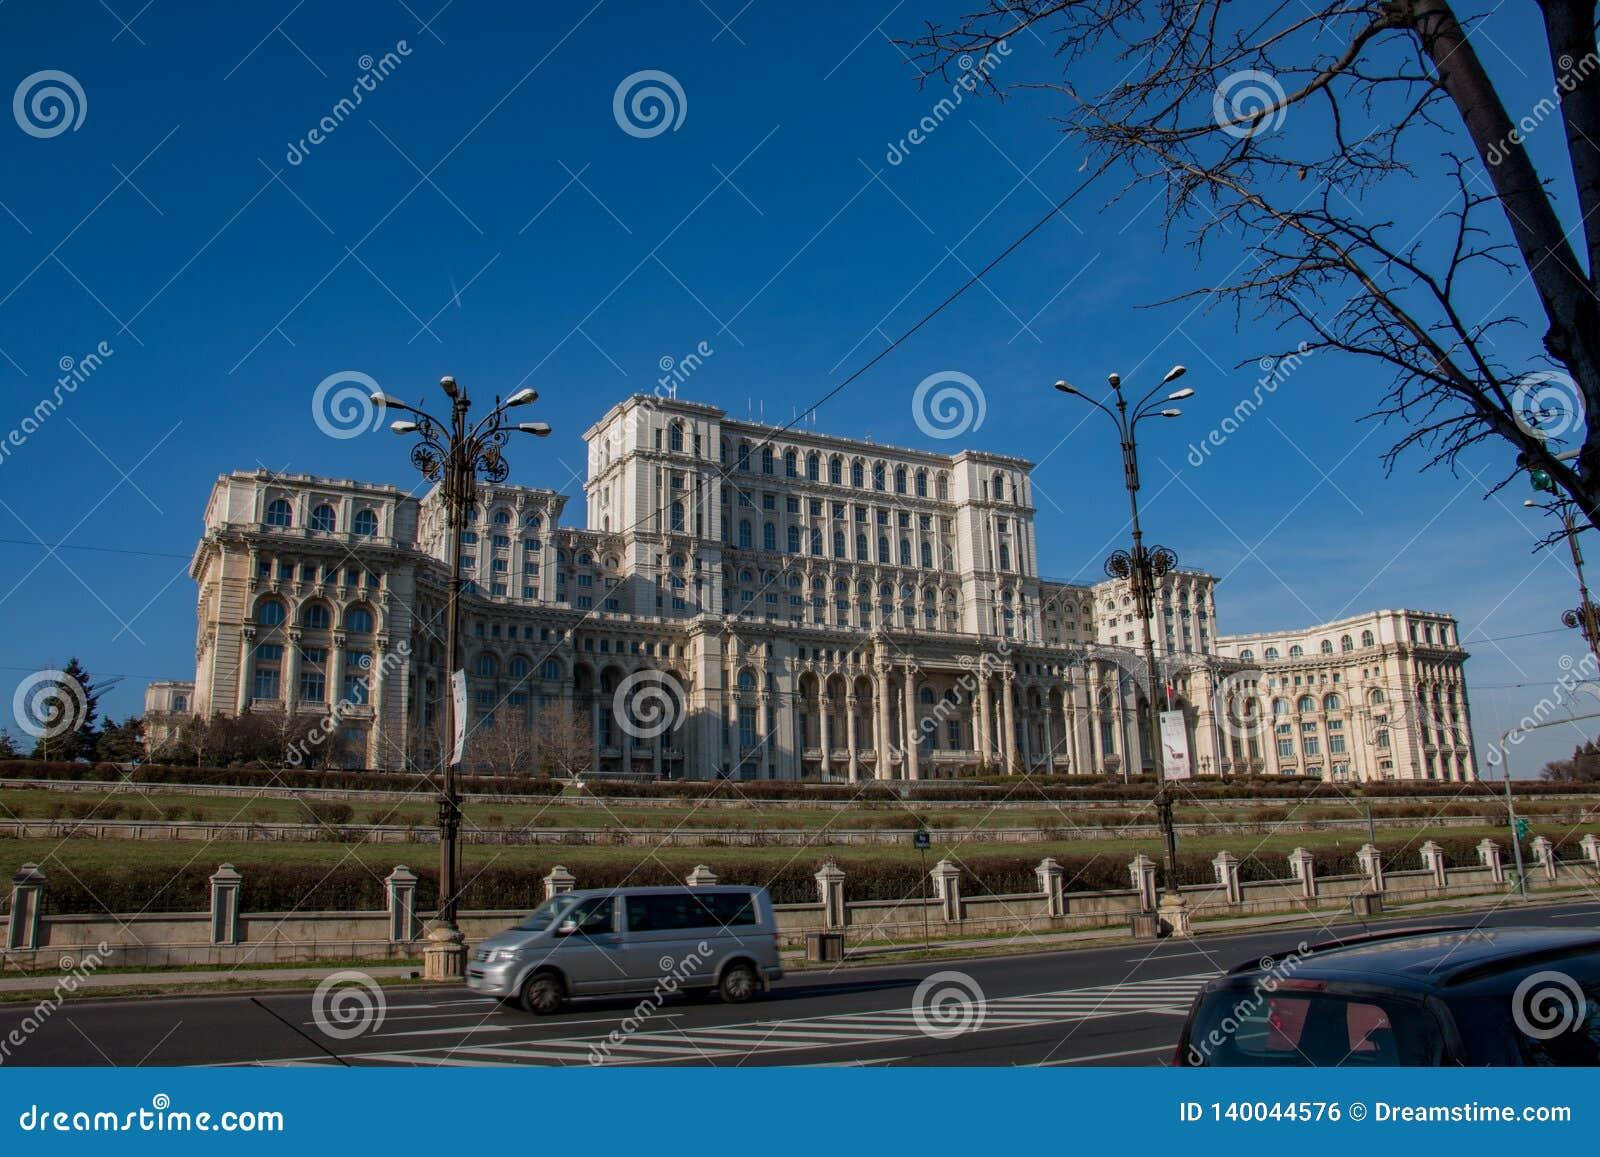 Palace of Parliament Bucharest, capital of Romania